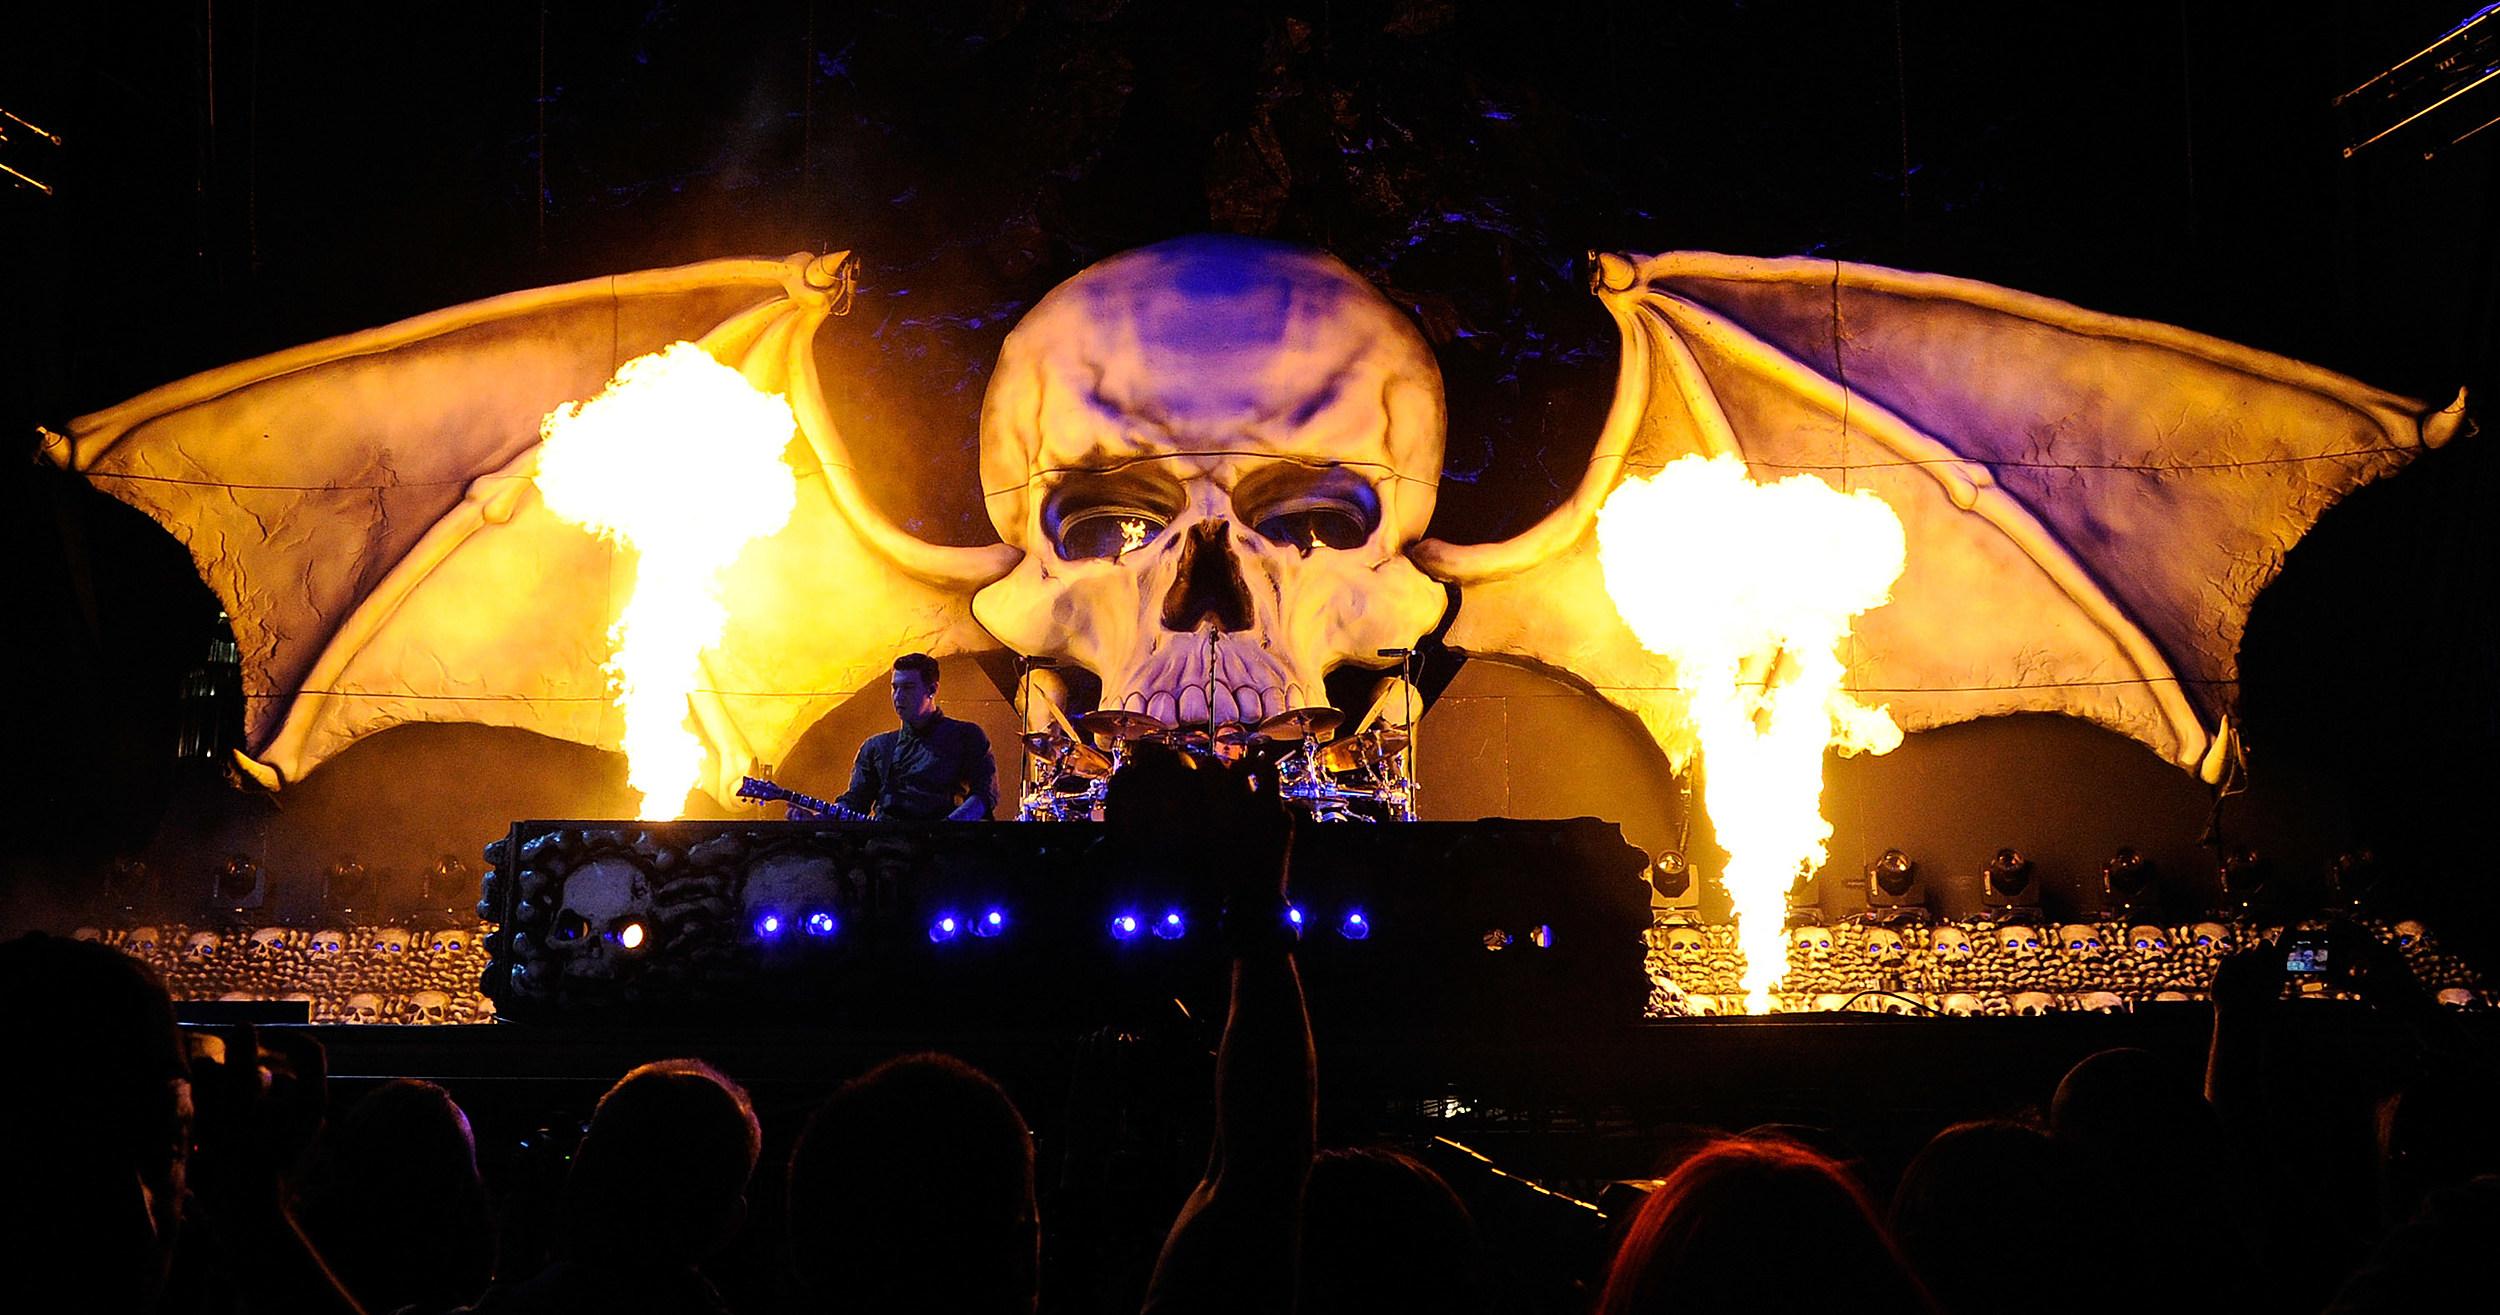 New Avenged Sevenfold video